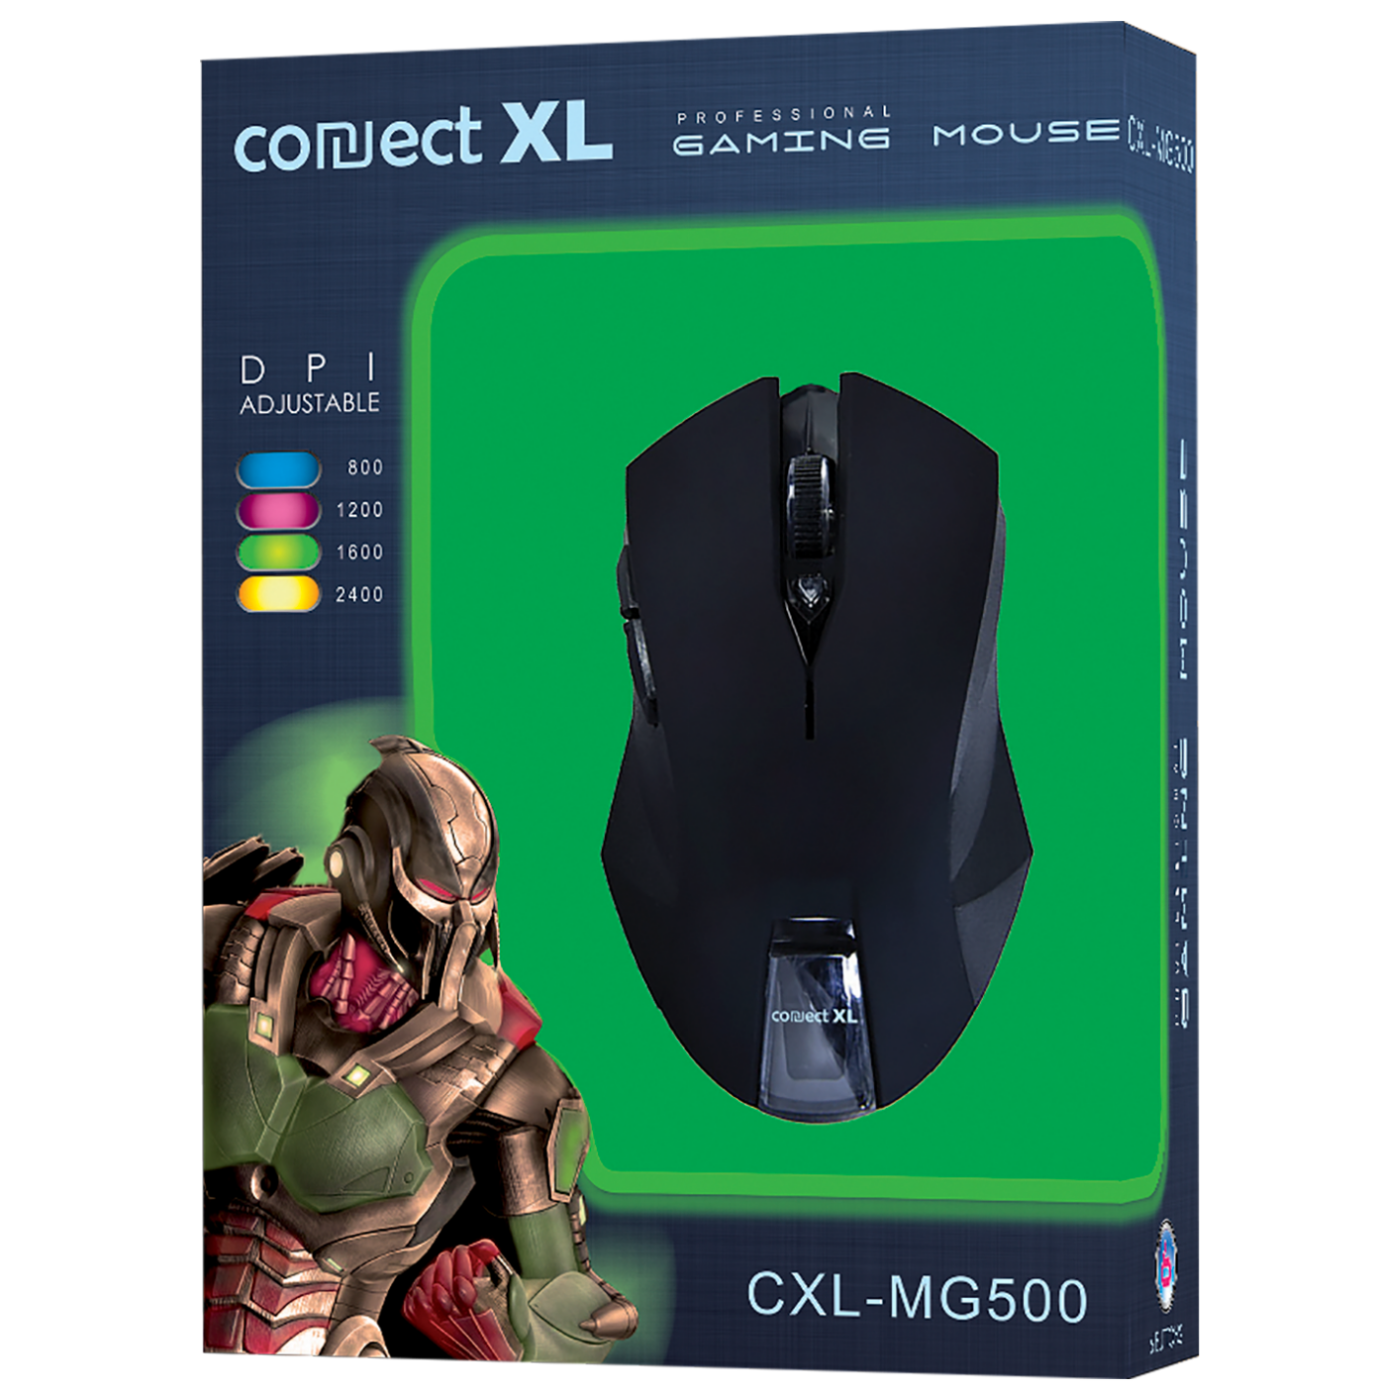 CXL-MG500